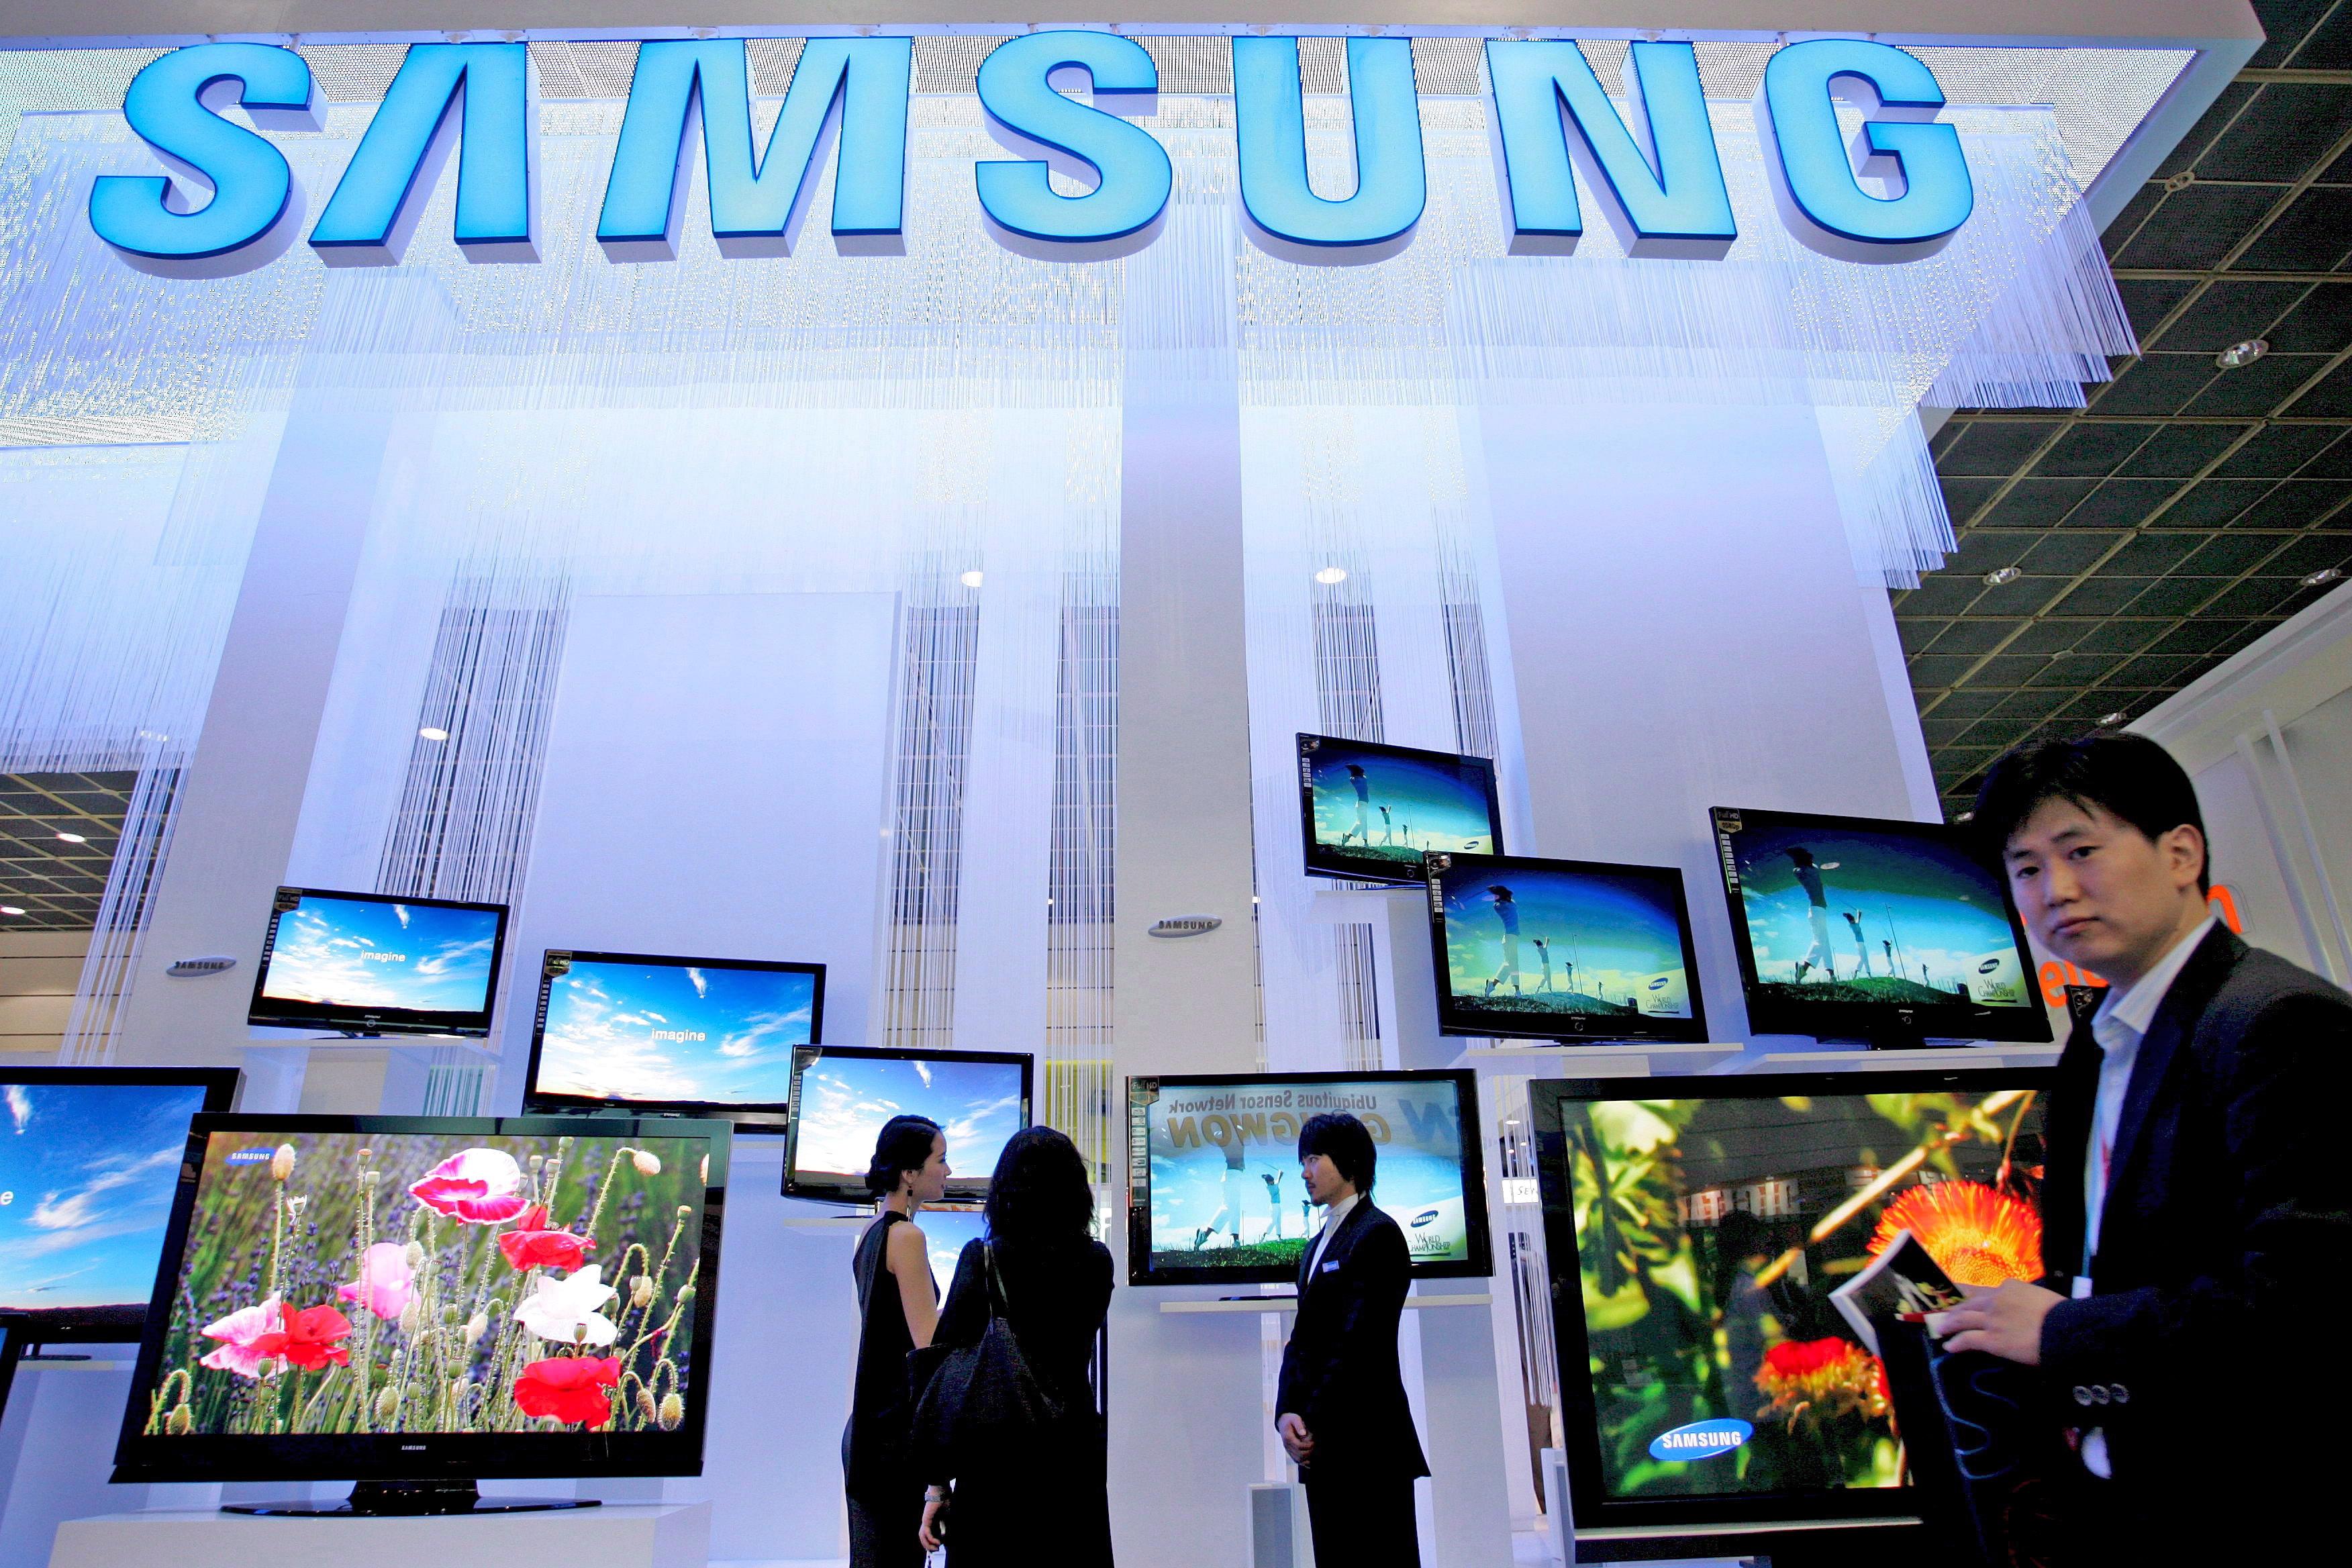 Samsung влага $7 млрд. в еко проект